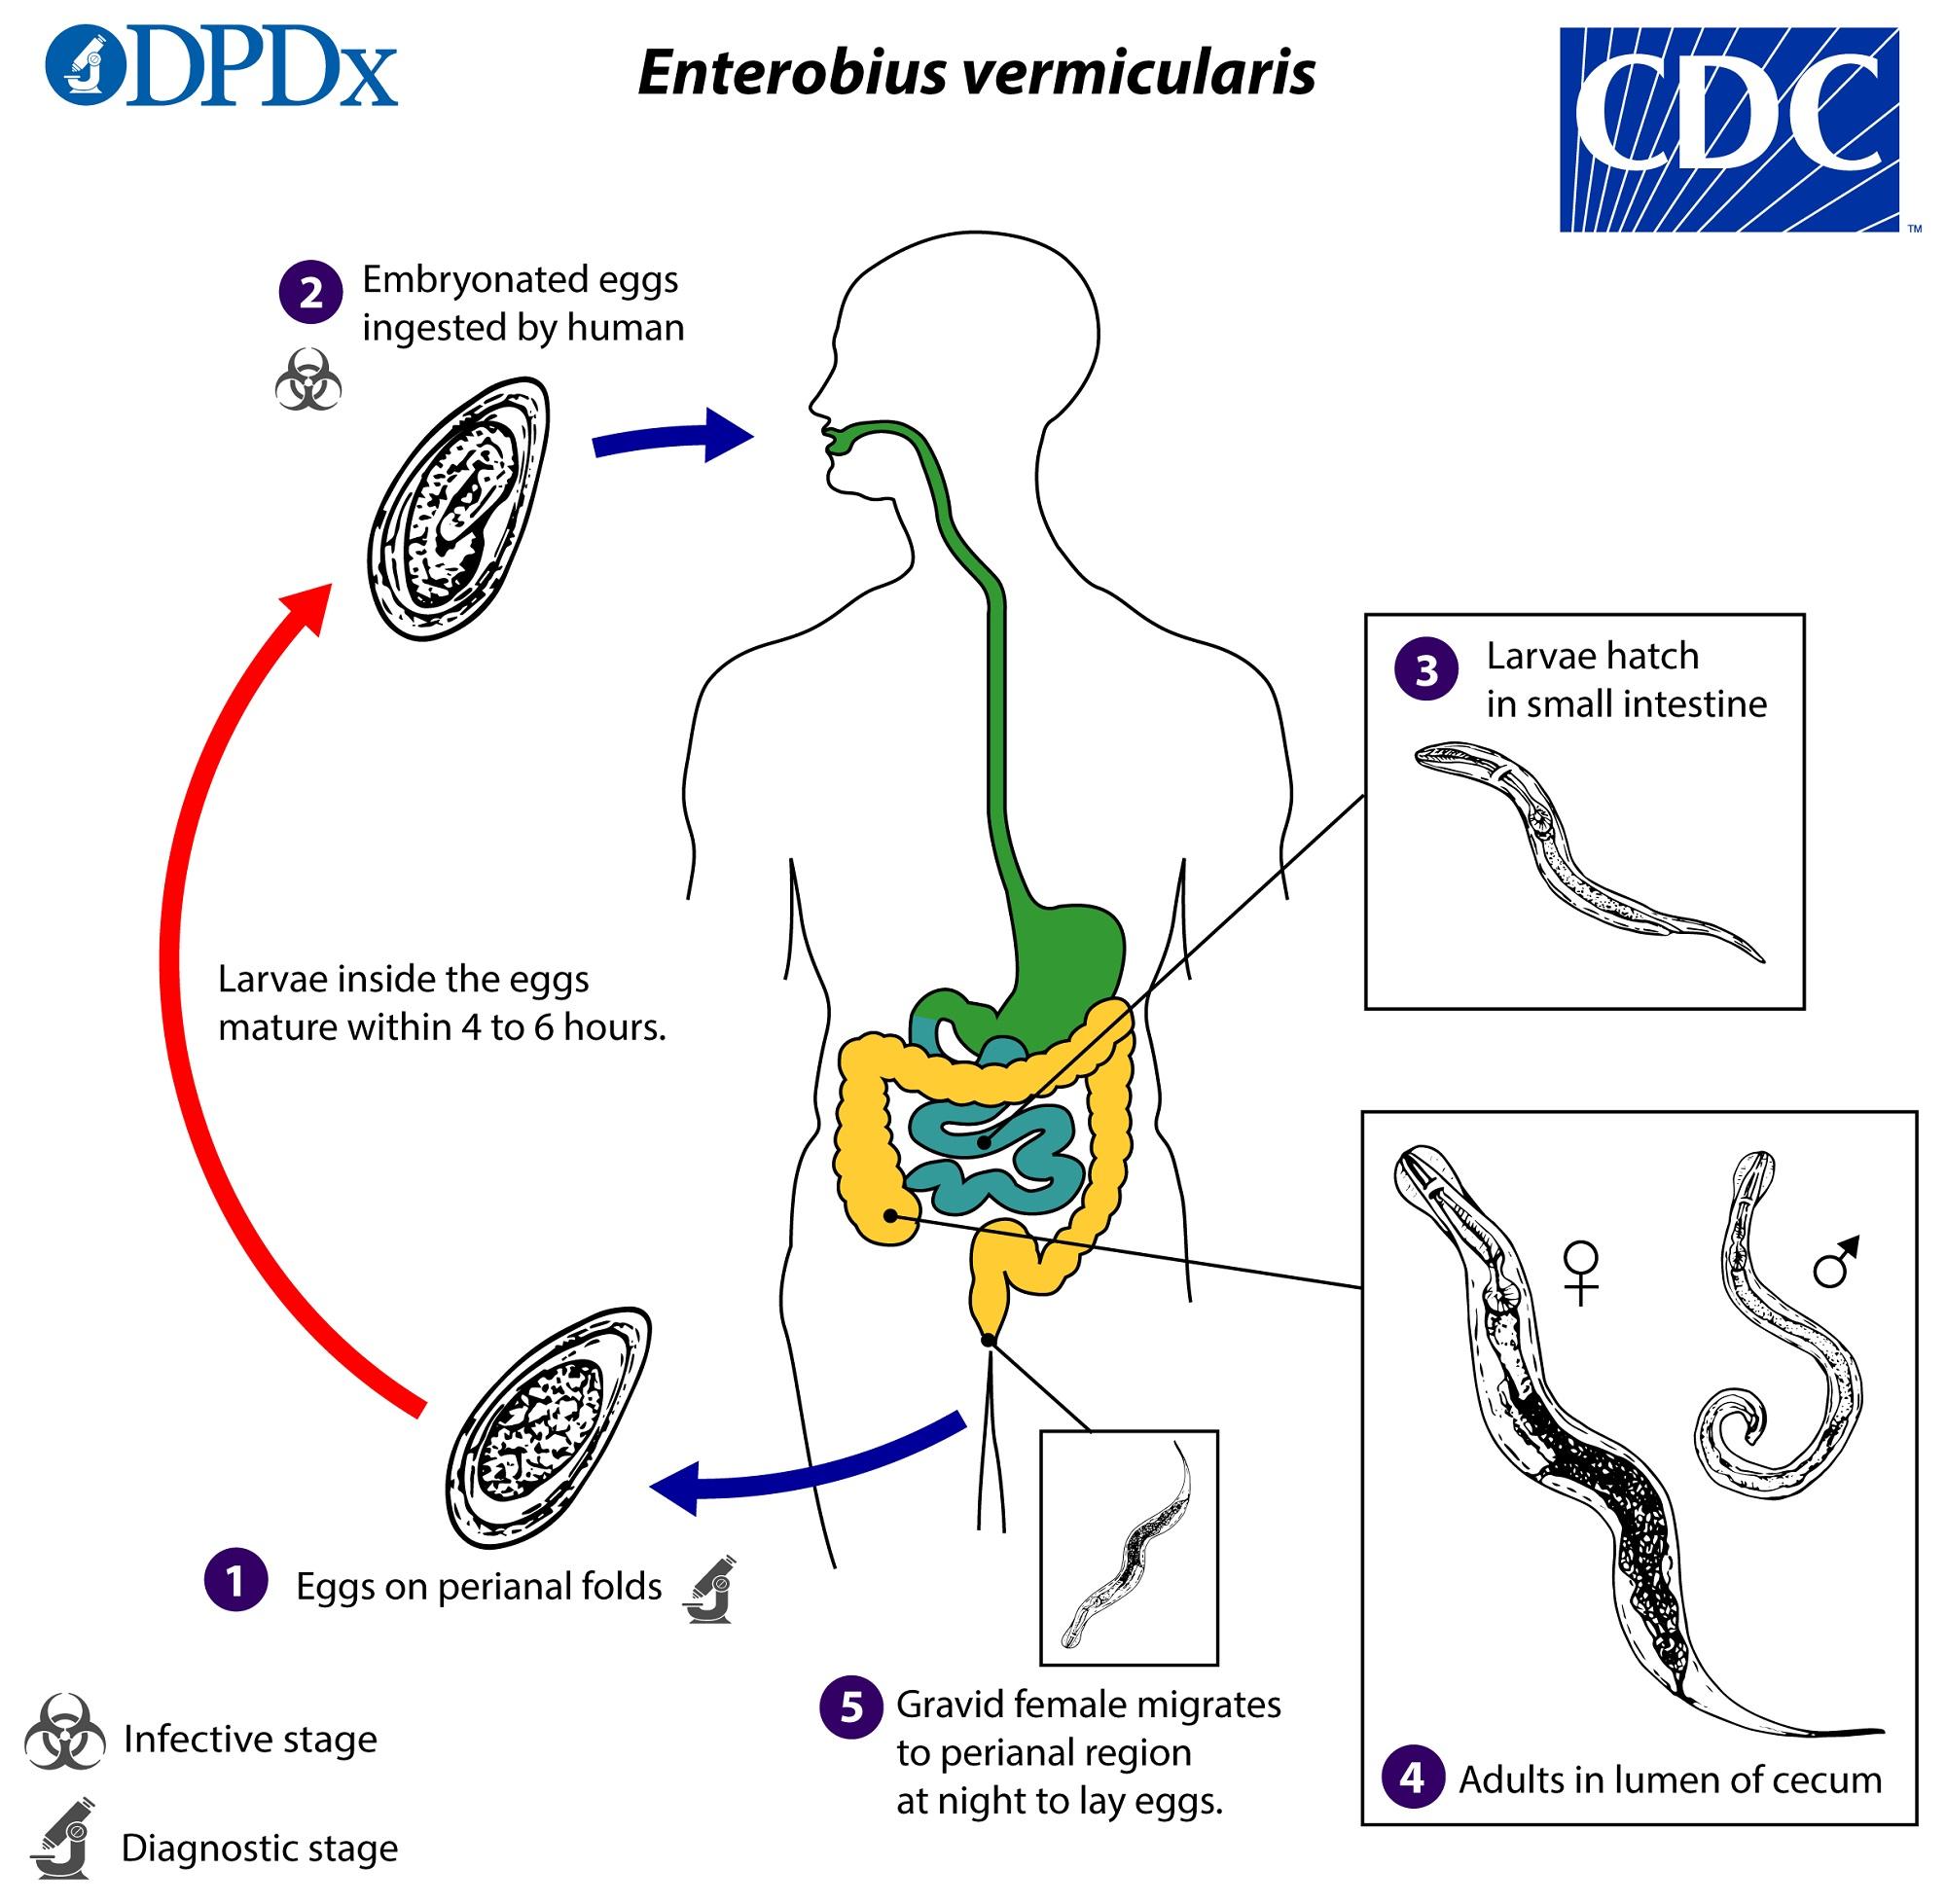 tabel de fază de dezvoltare pinworm endometrial cancer nedir